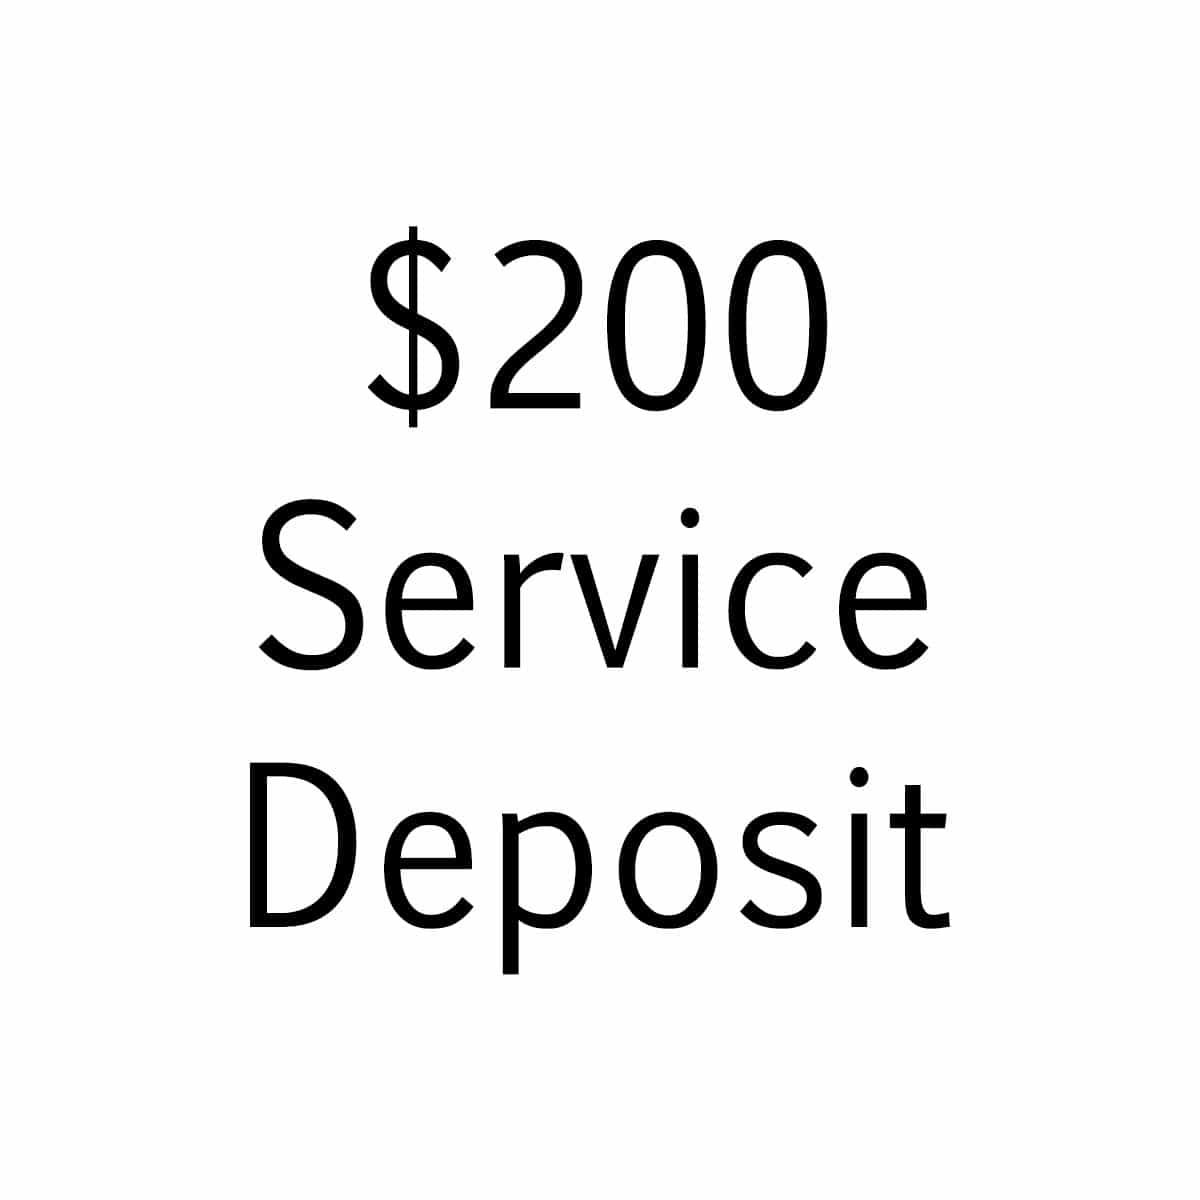 Service deposit $200